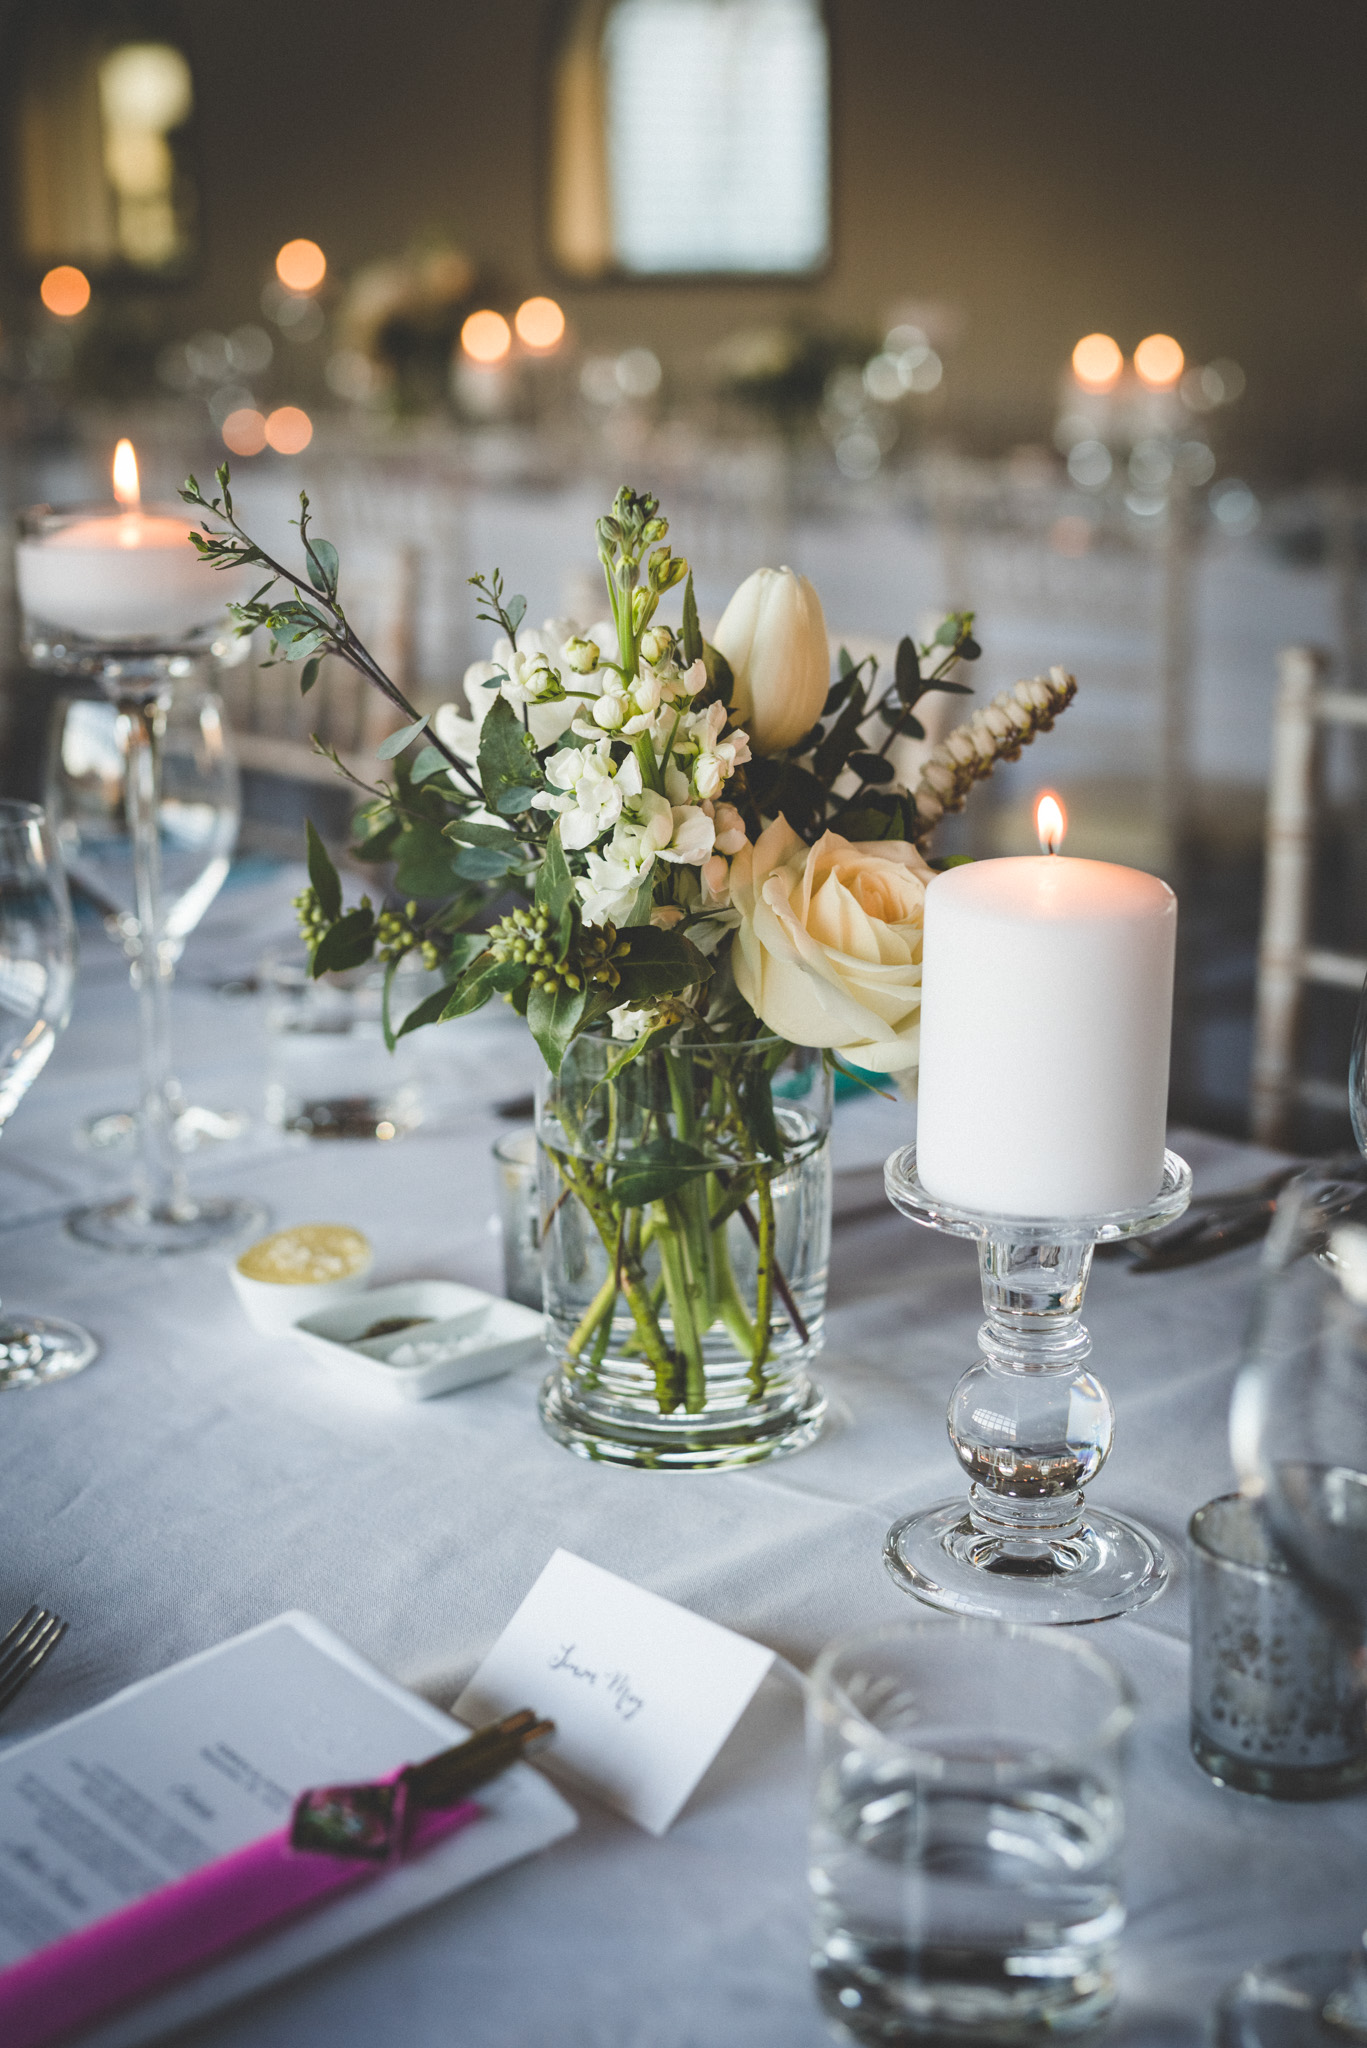 wedding table decor by mount soho wedding stylist